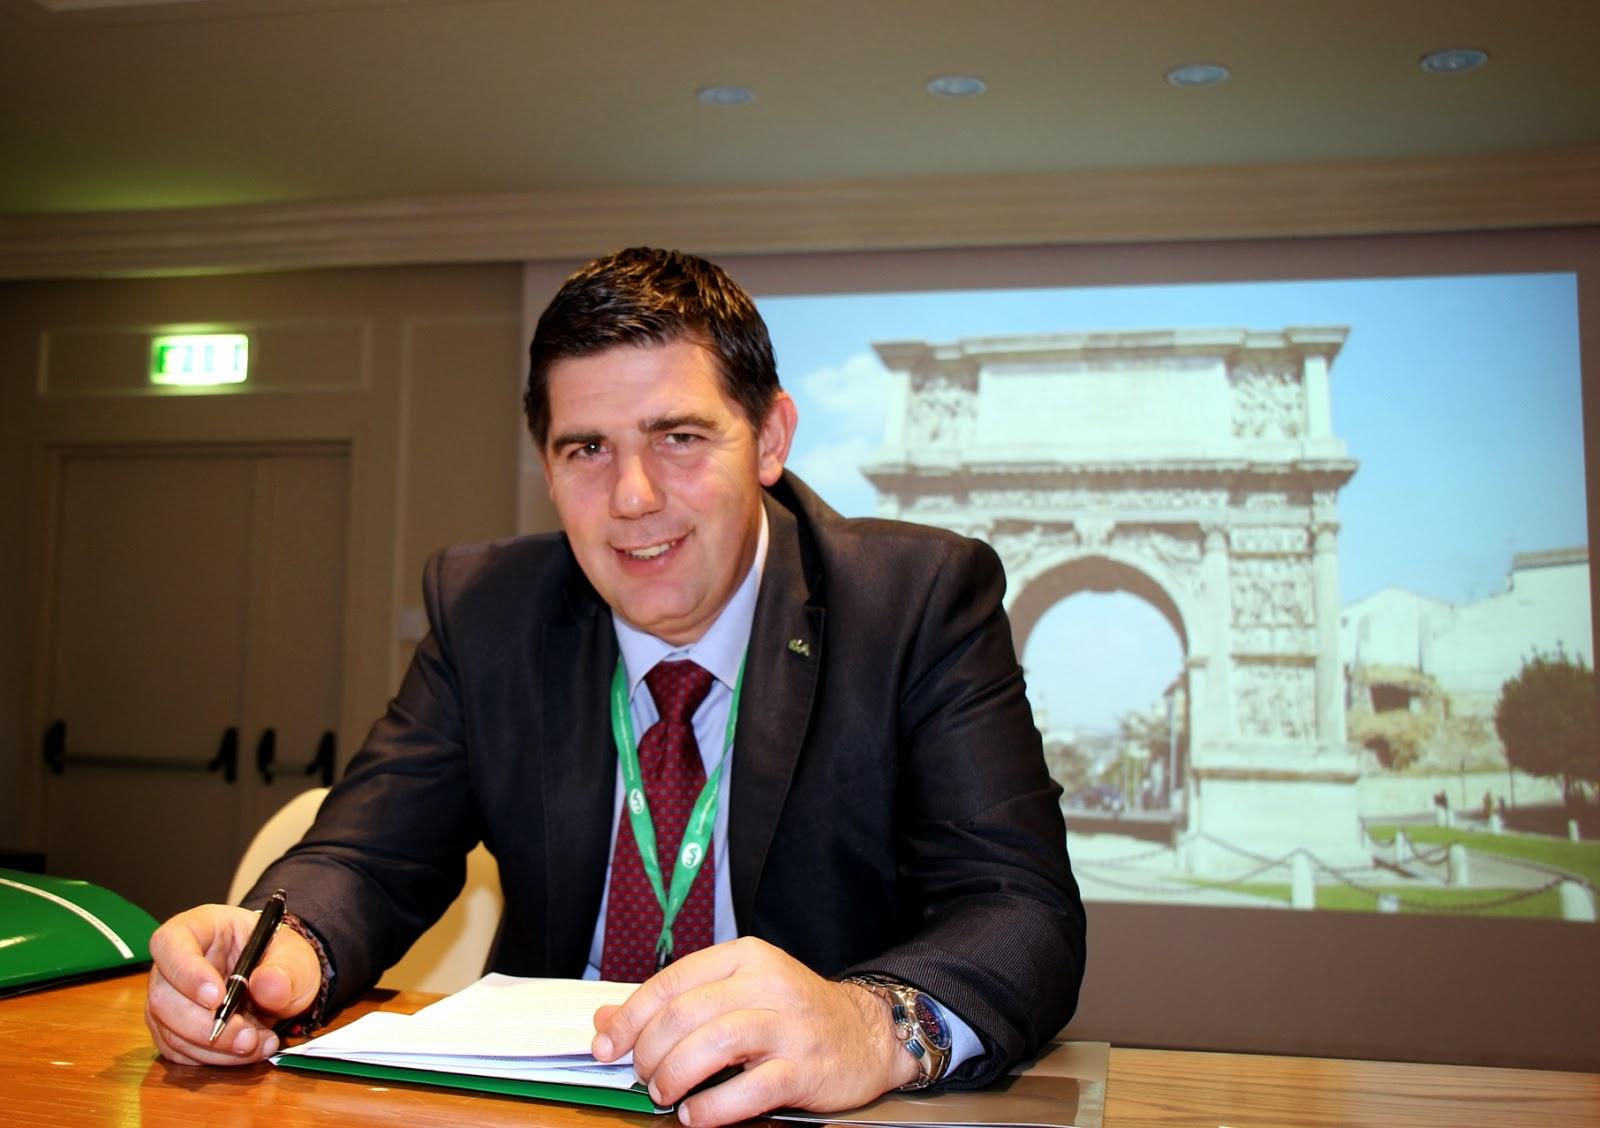 Alessandro Mastrocinque Presidente Regionale della Cia Campania